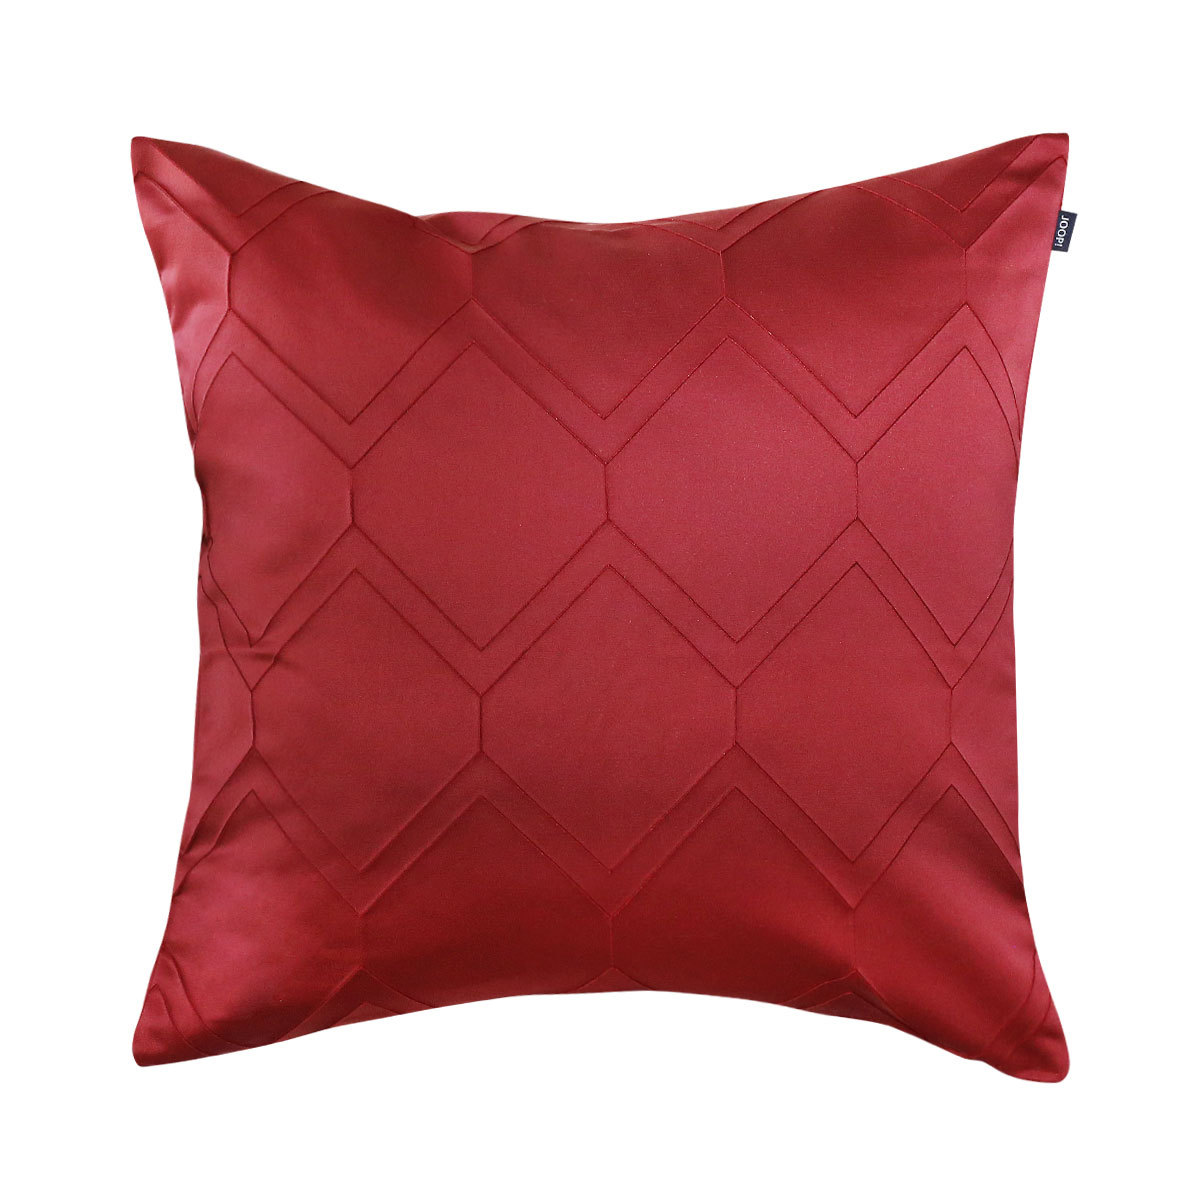 joop kissenh lle elegana rot g nstig online kaufen bei bettwaren shop. Black Bedroom Furniture Sets. Home Design Ideas